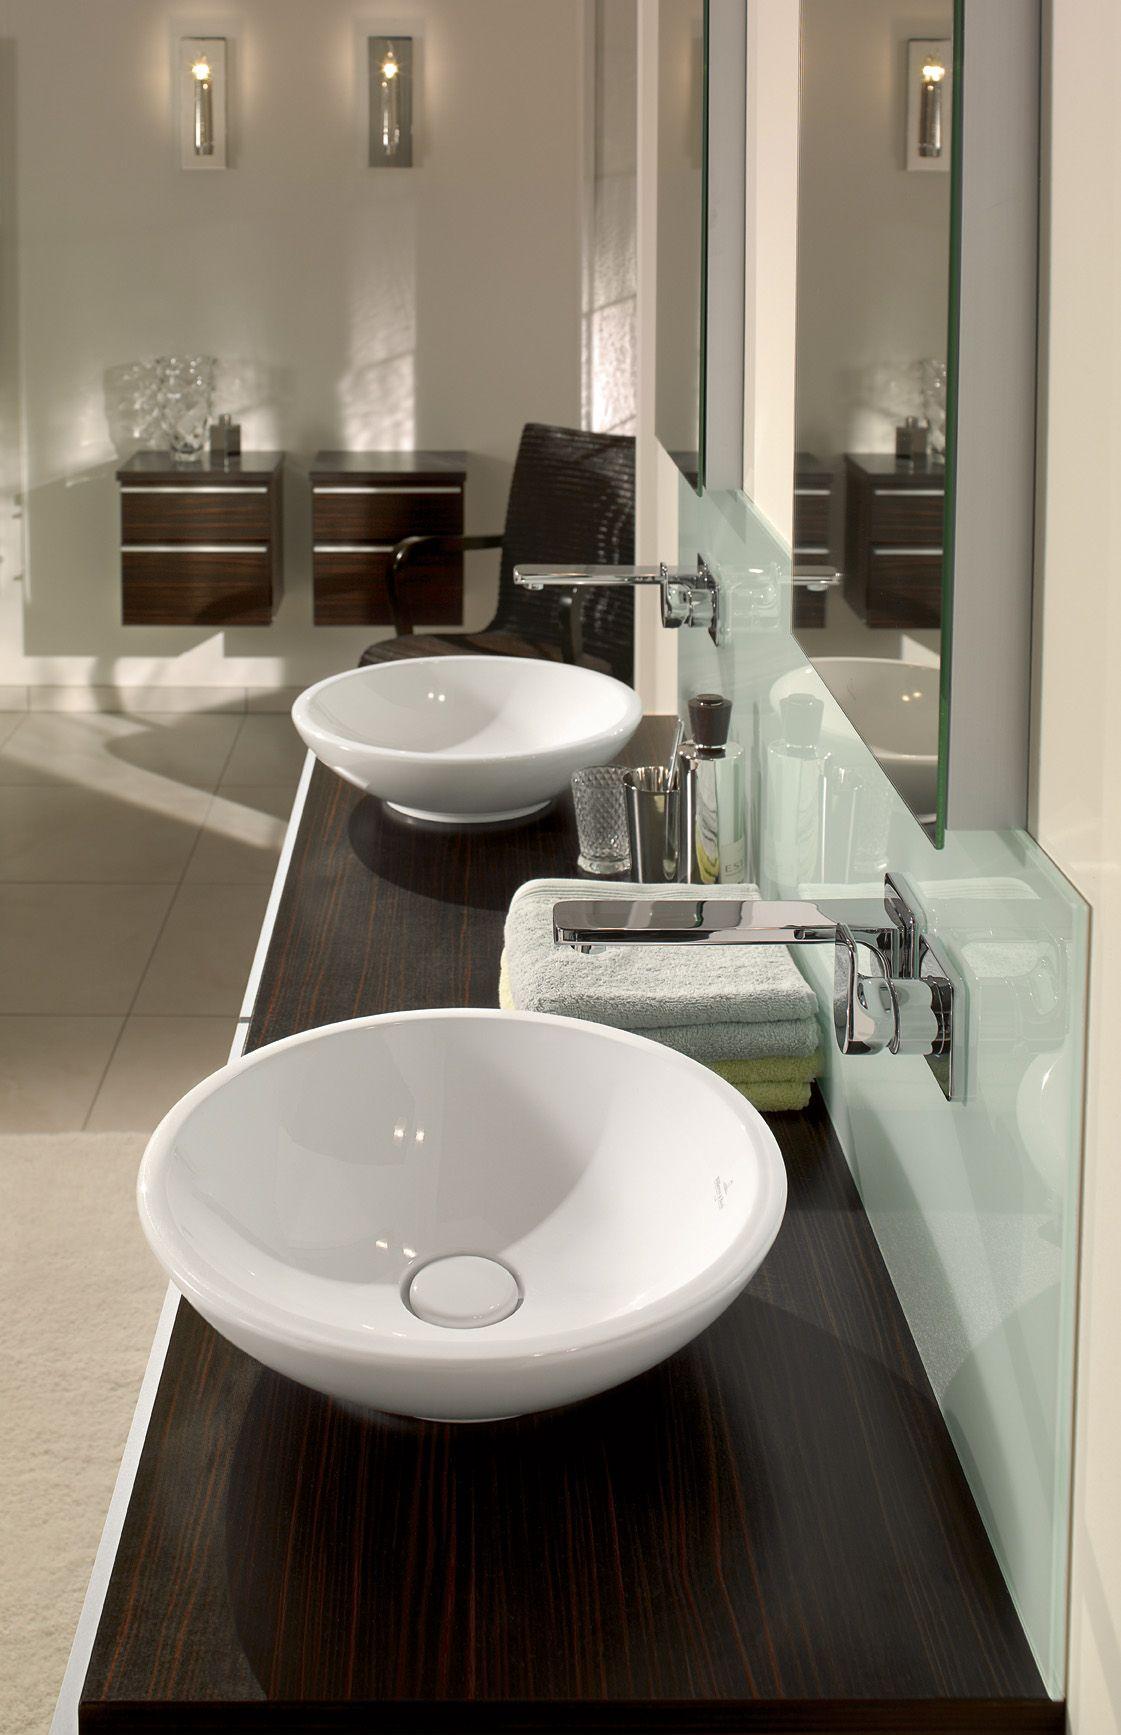 villeroy boch loop friends badkamer toilet pinterest bathroom furniture sinks. Black Bedroom Furniture Sets. Home Design Ideas